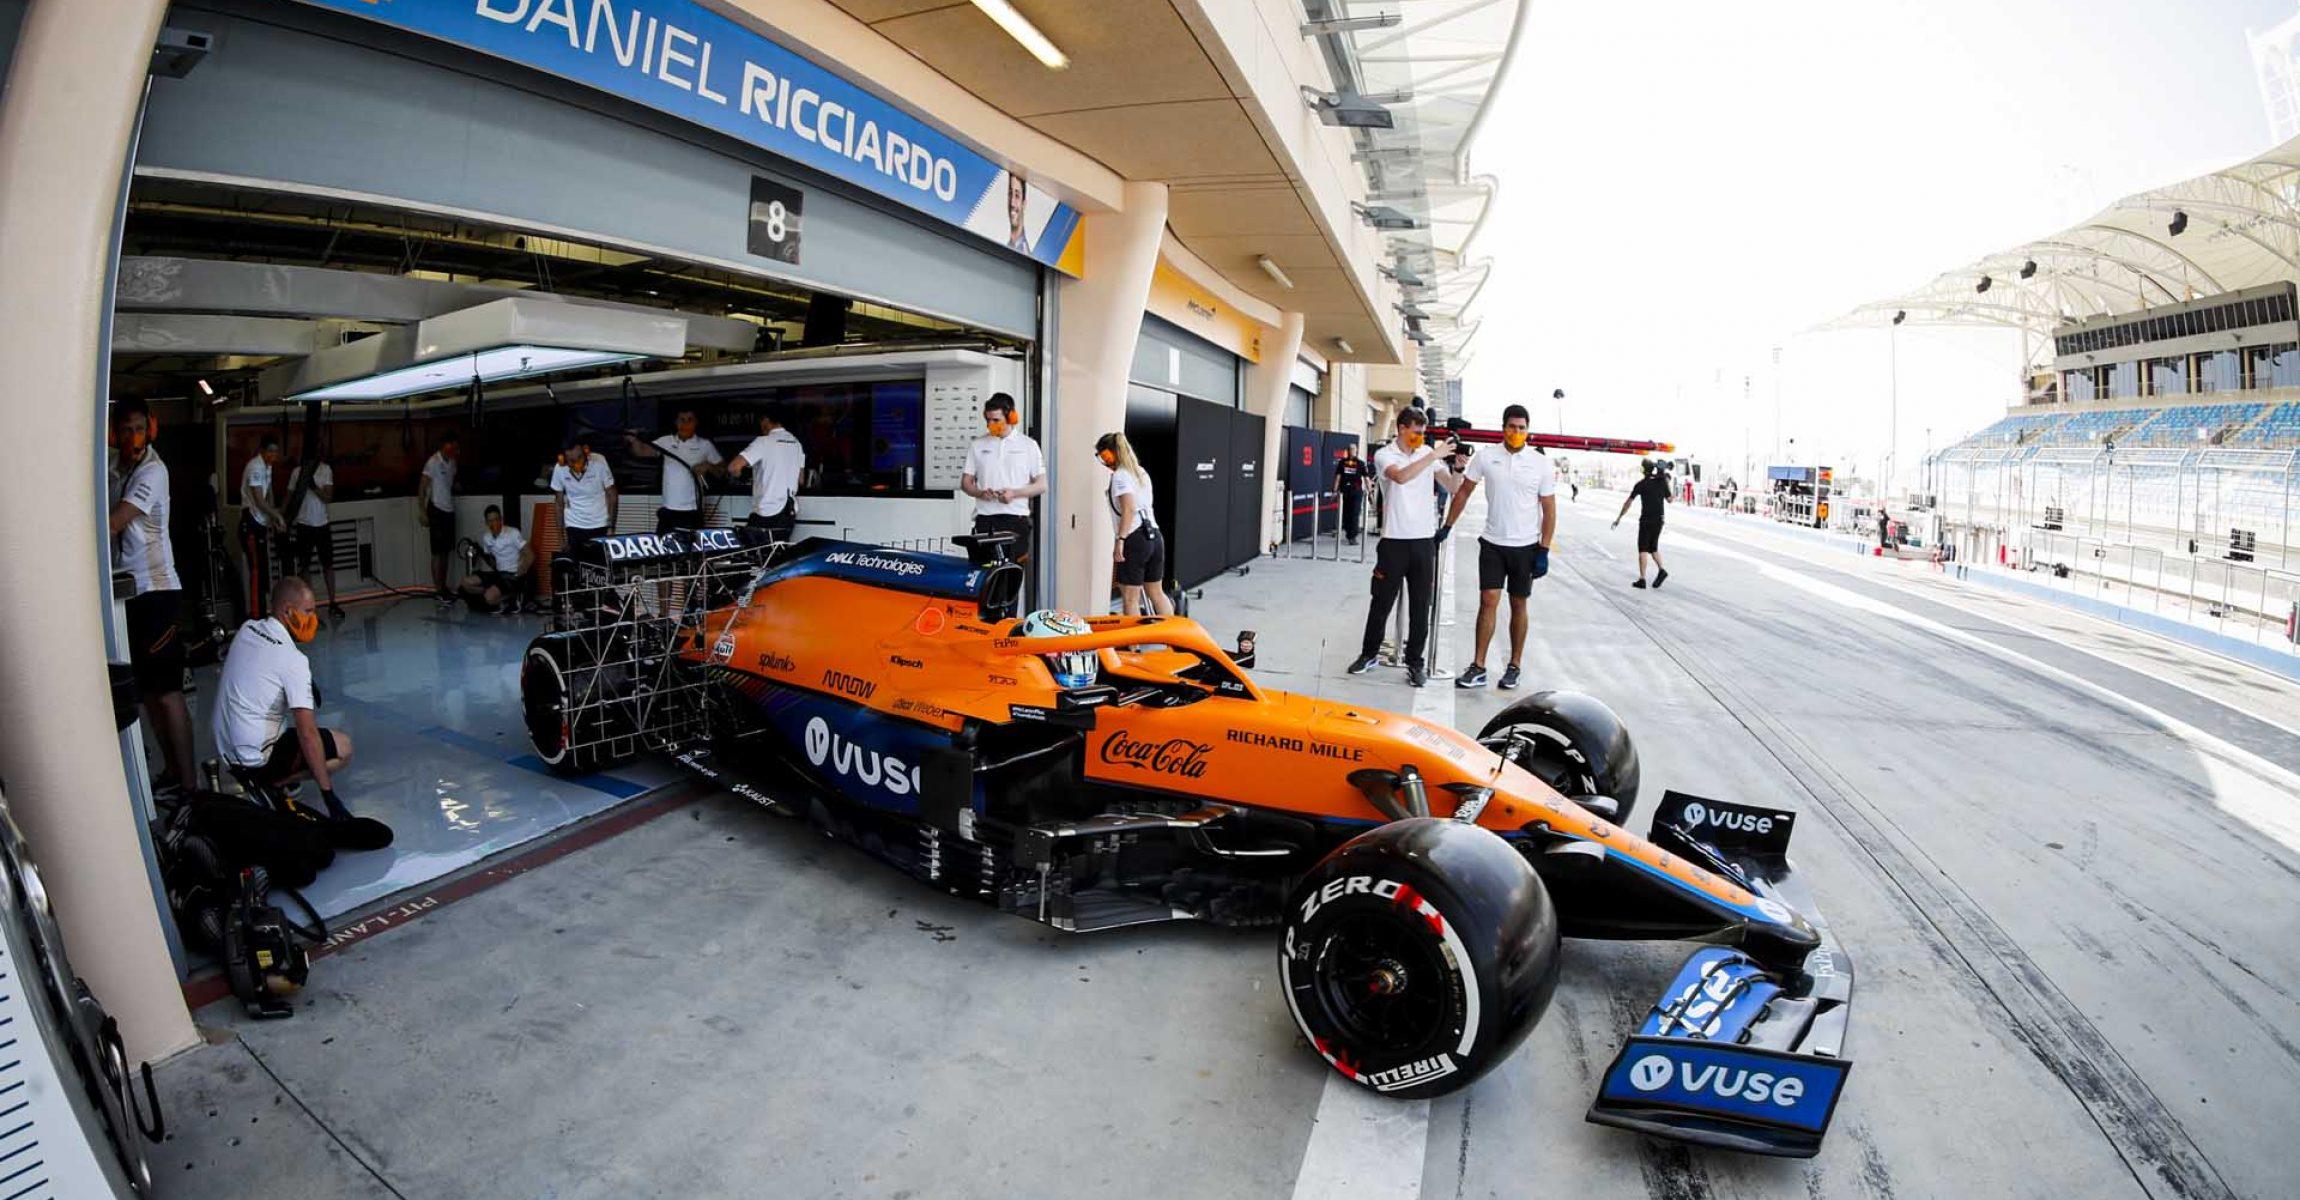 Daniel Ricciardo, McLaren MCL35M, exits his pit garage